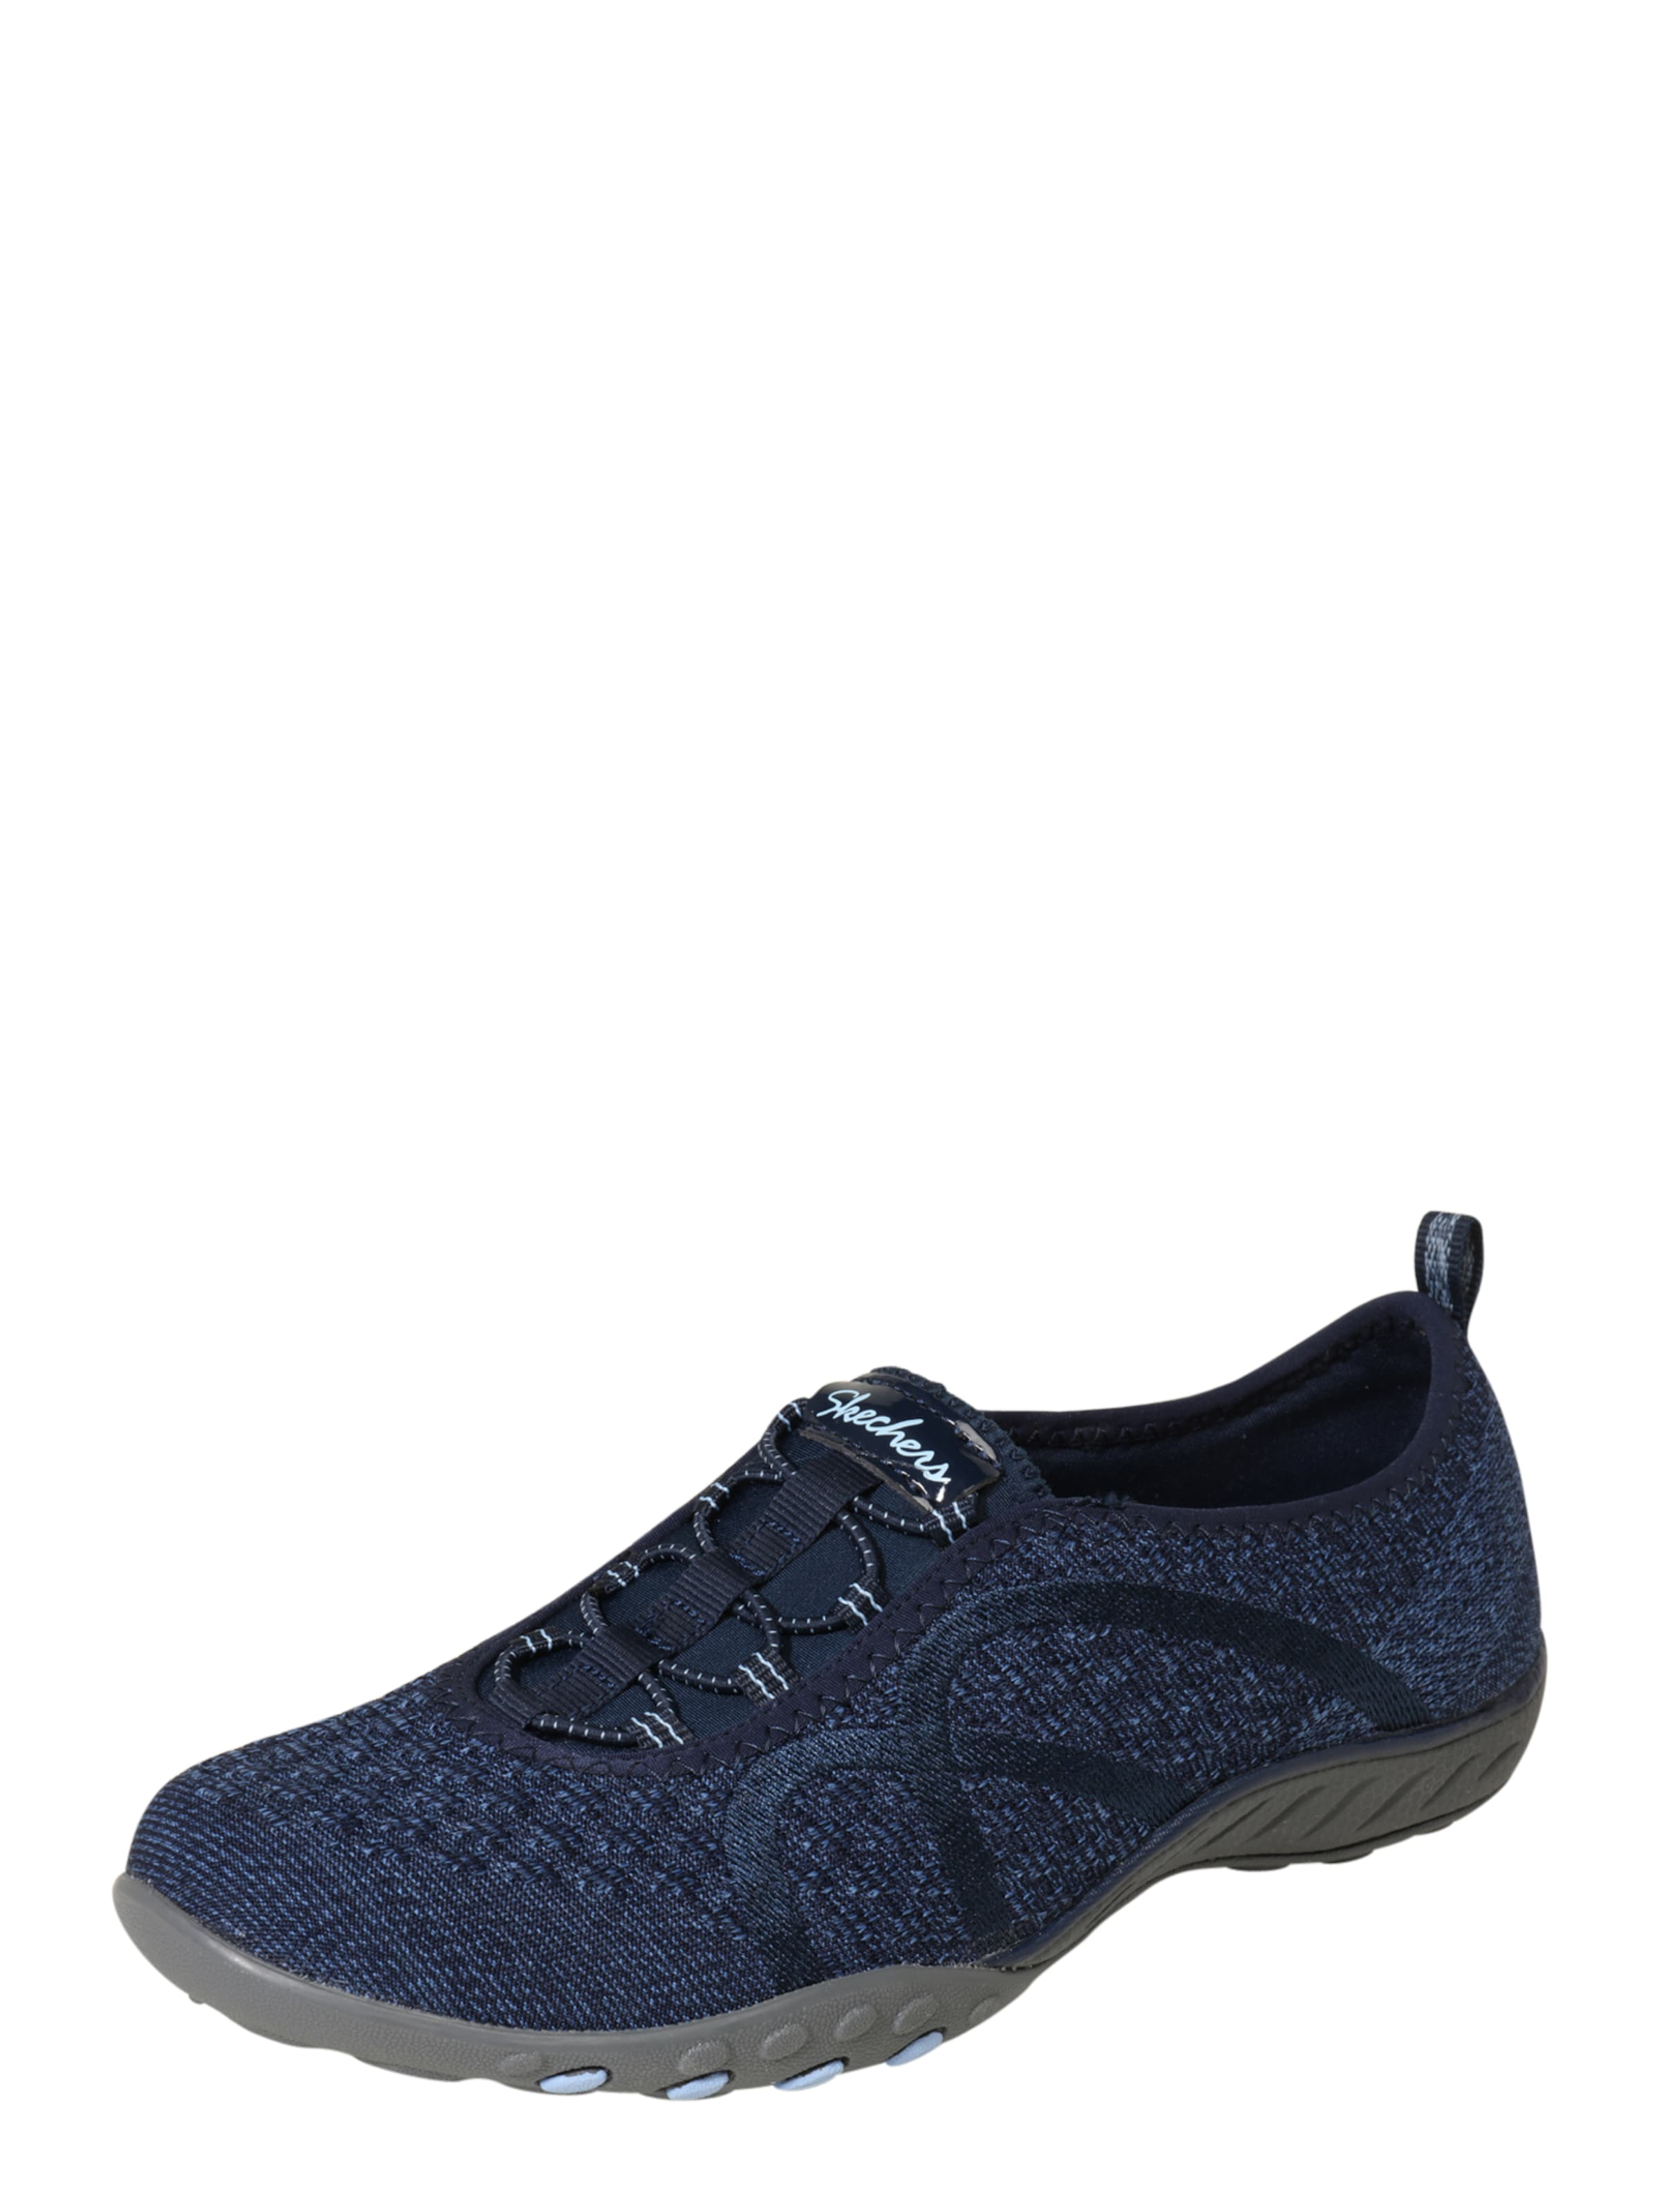 Sketchers Chaussures De Sport Laag « Respirer-facile Fortune » Marine fGeCnT